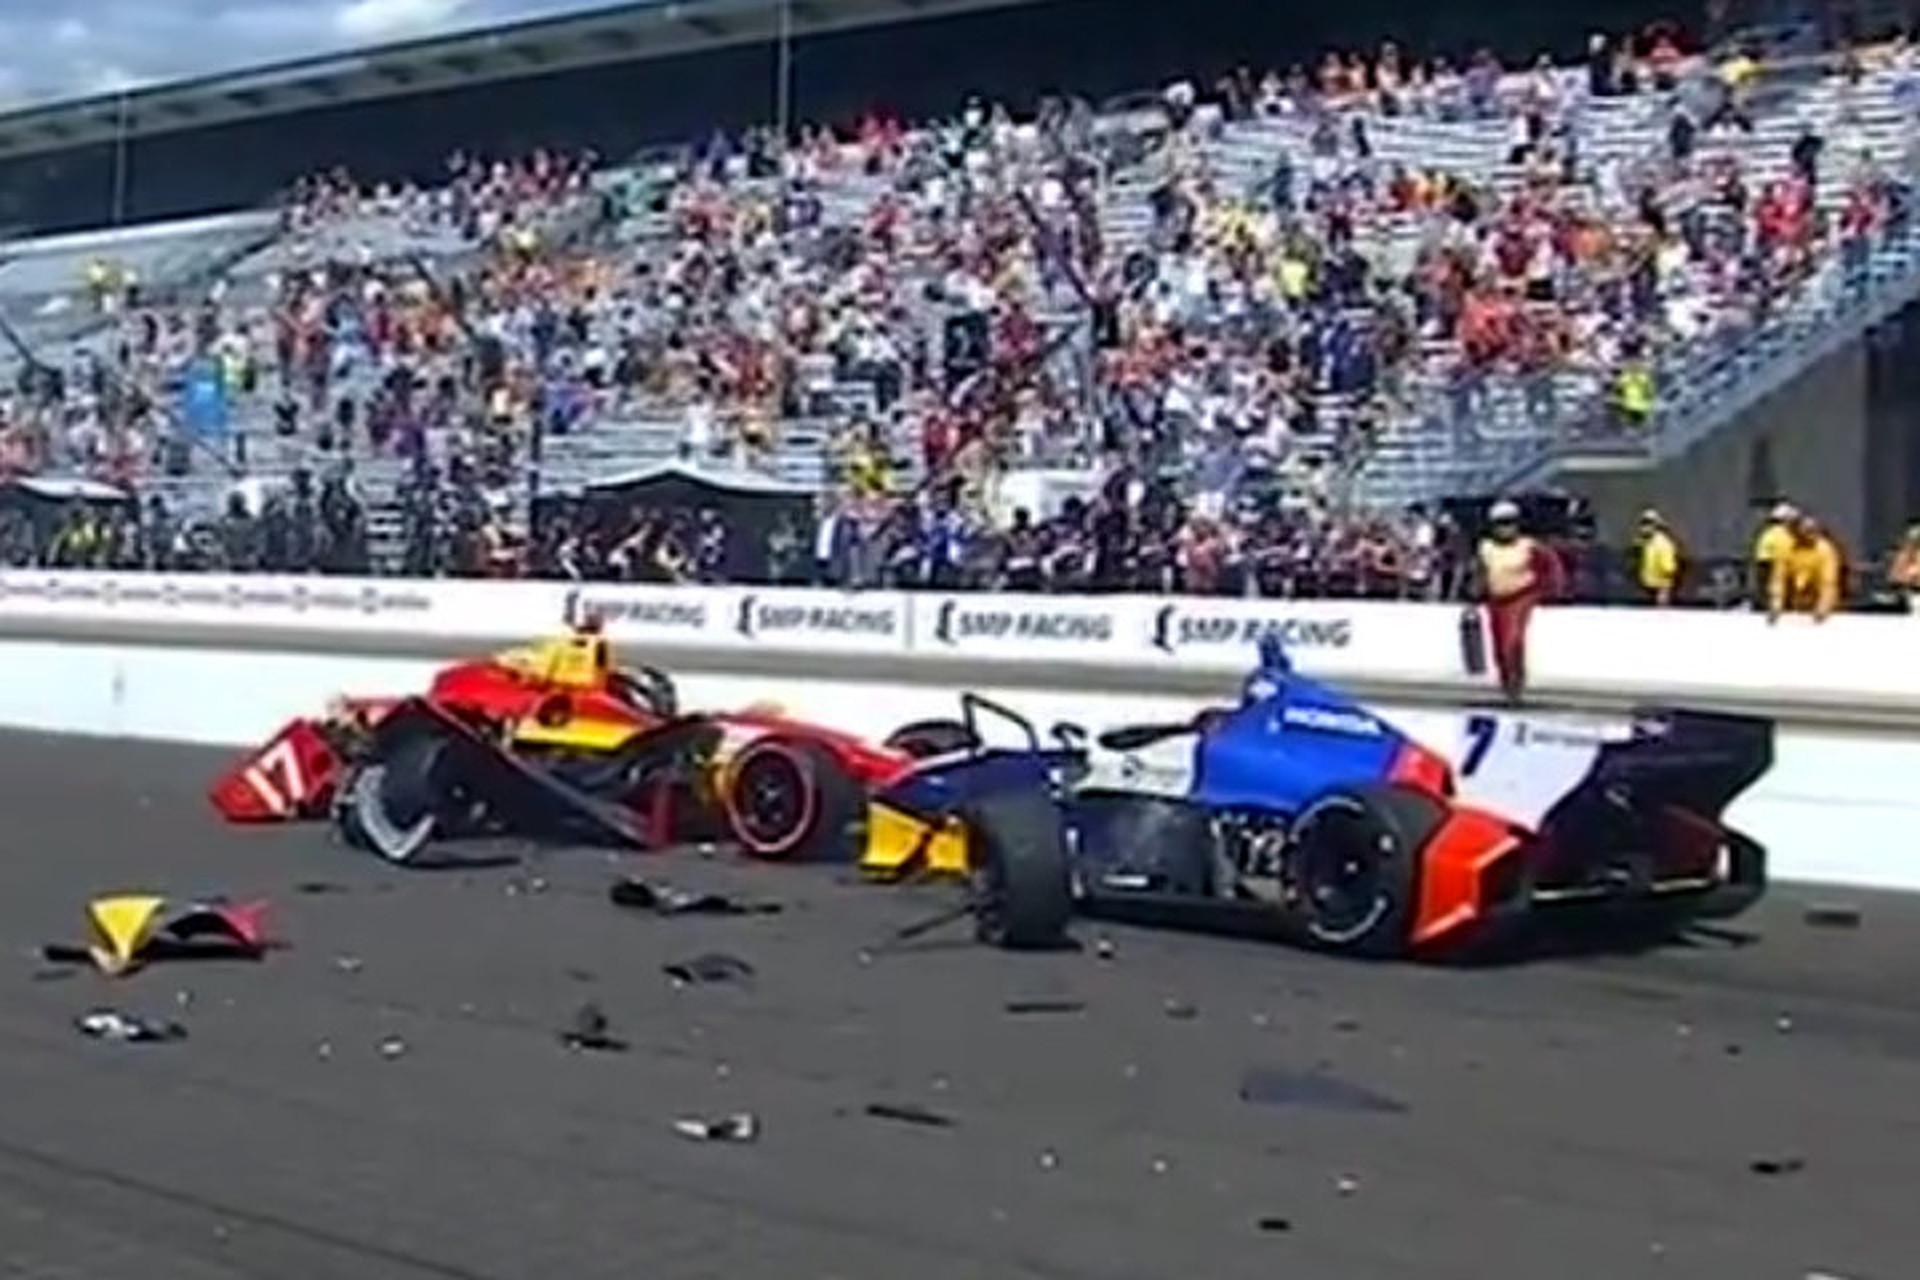 Intense Crash at Start of Indianapolis Grand Prix [Video]